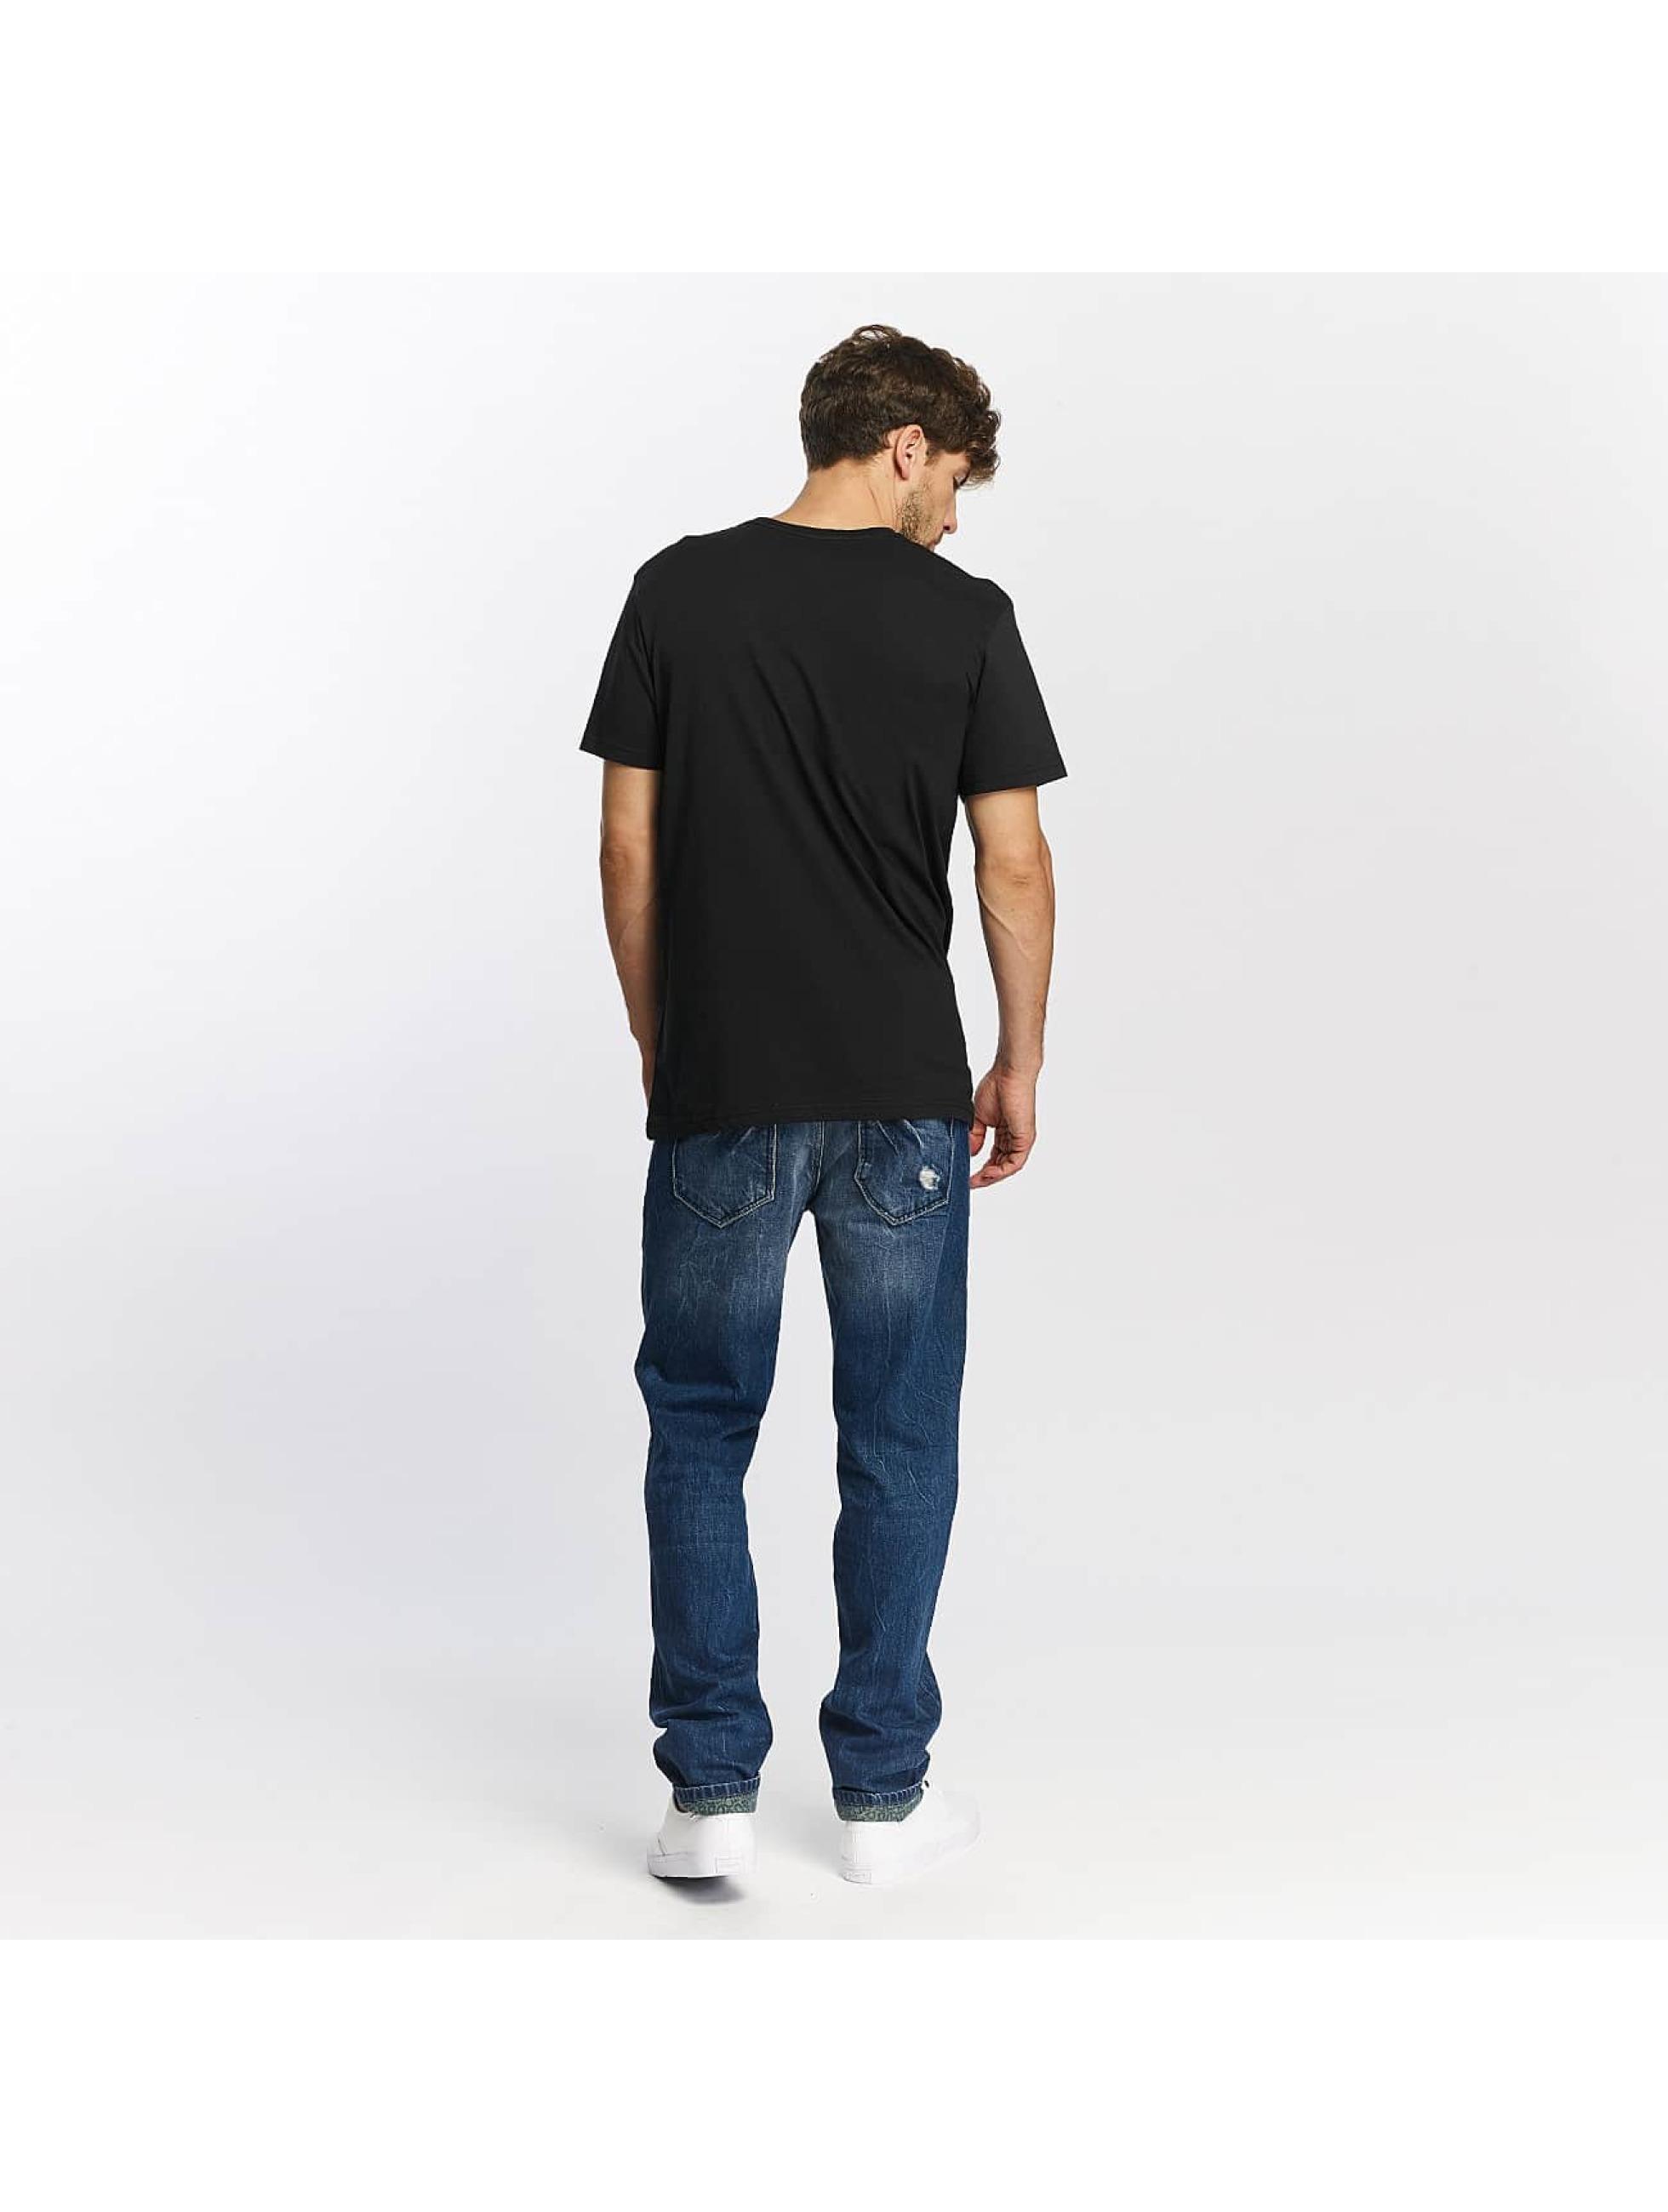 Quiksilver t-shirt Classic Comfort Place zwart